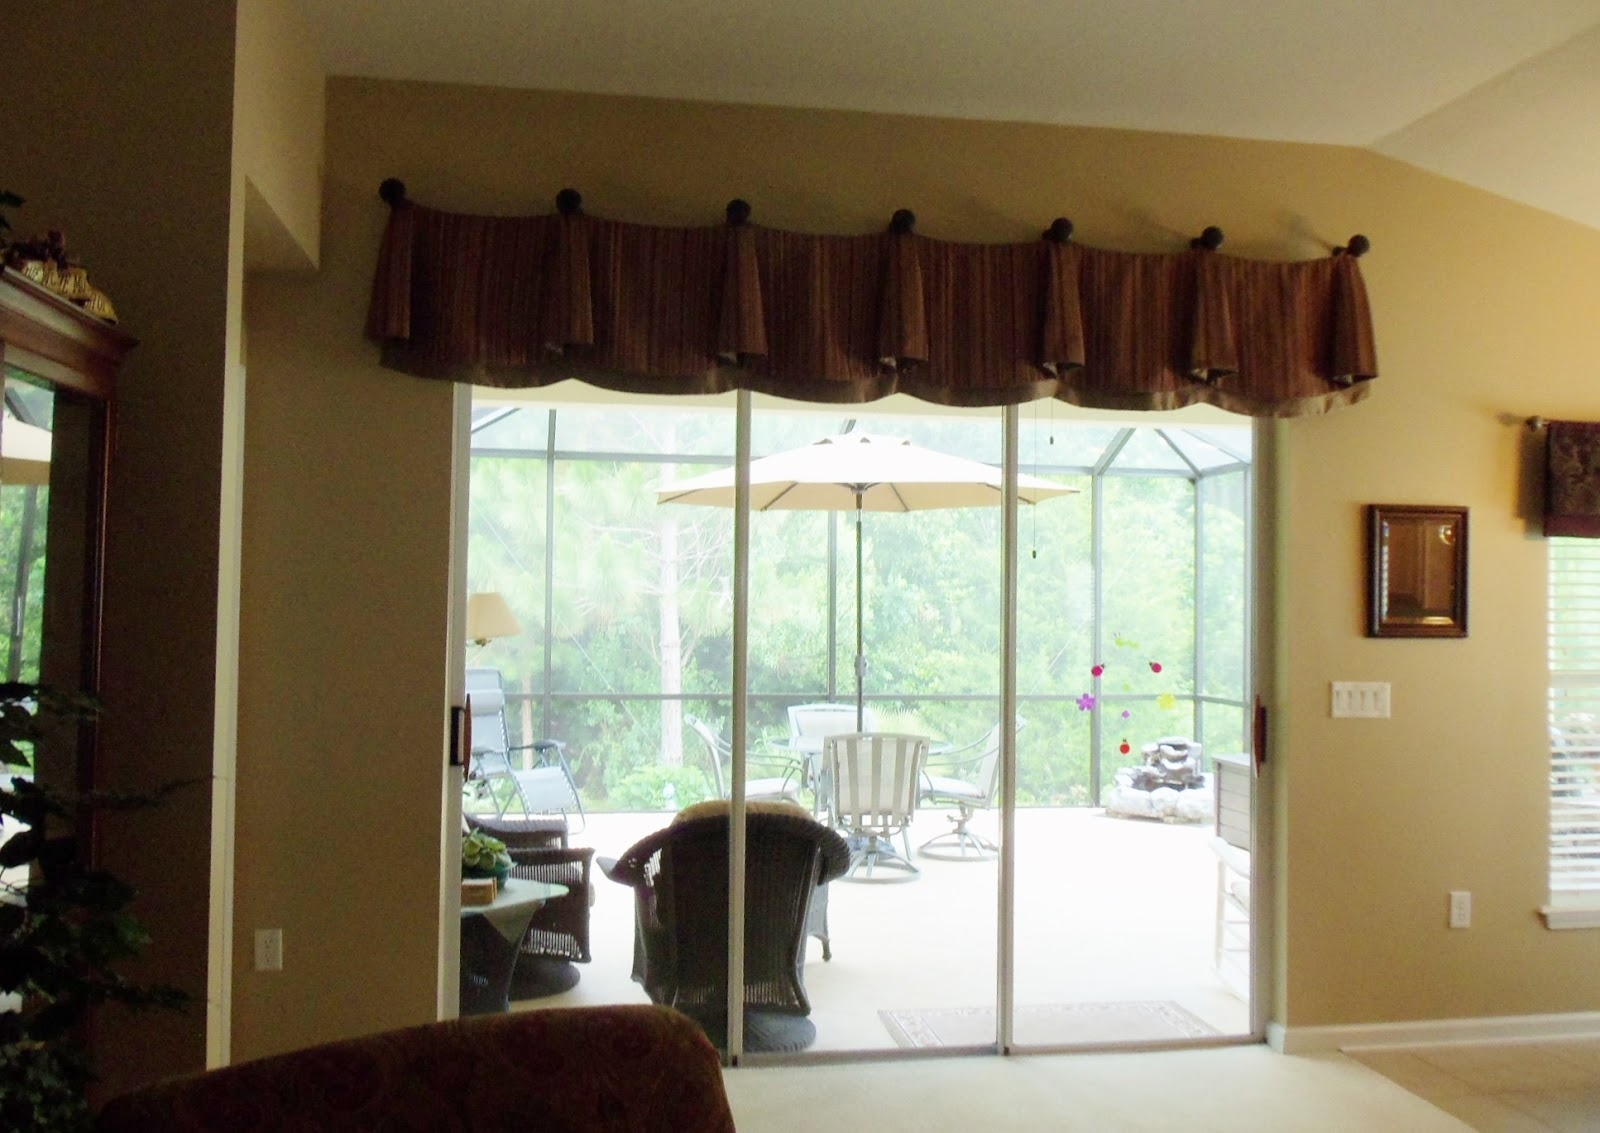 Decorating Ideas Over Sliding Glass DoorsDecorating Ideas Over Sliding Glass Doors